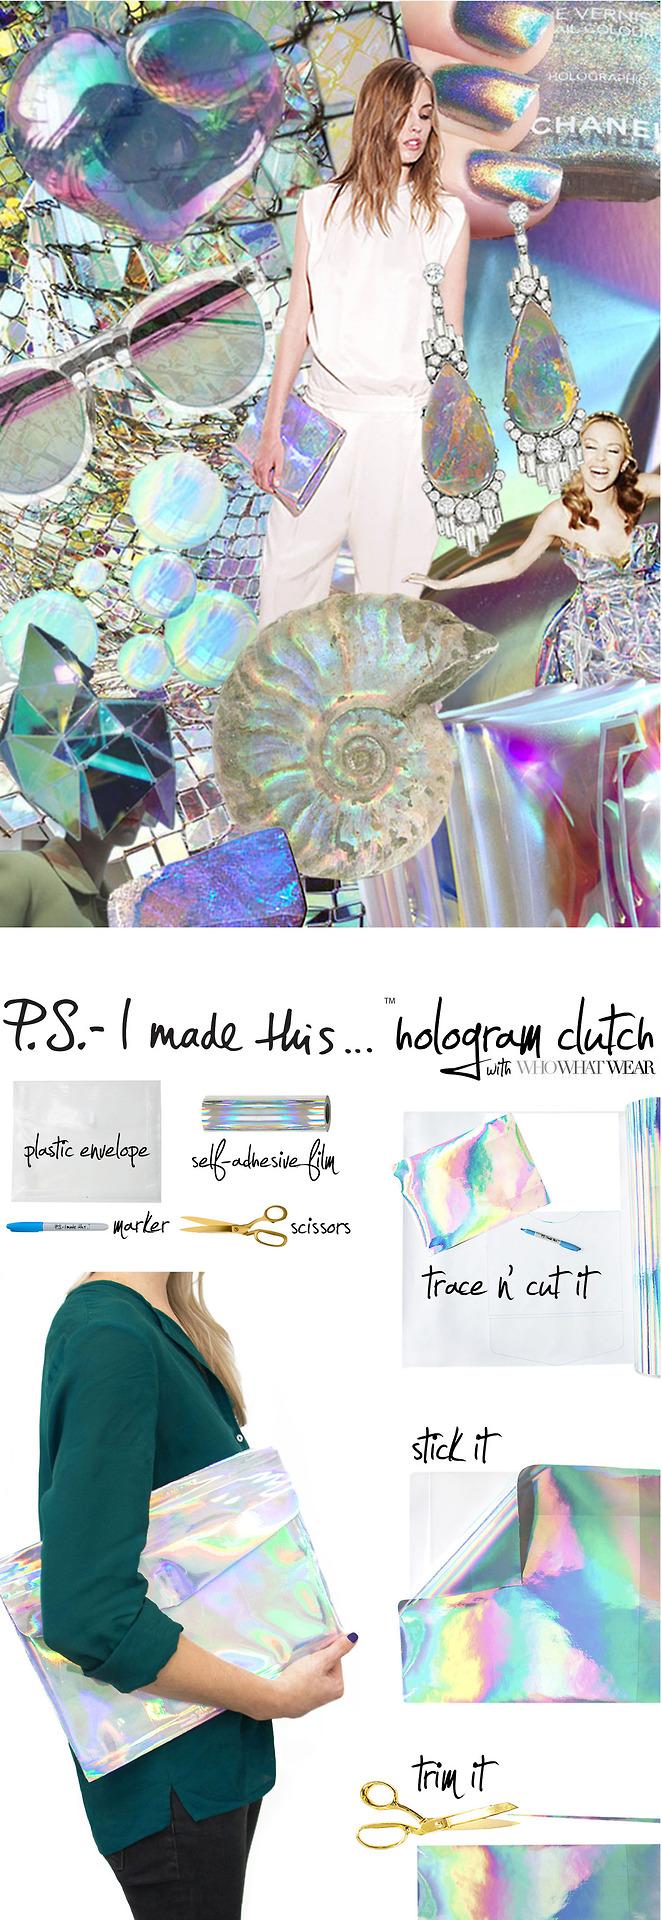 hologram_clutch-tumblr_MERGE